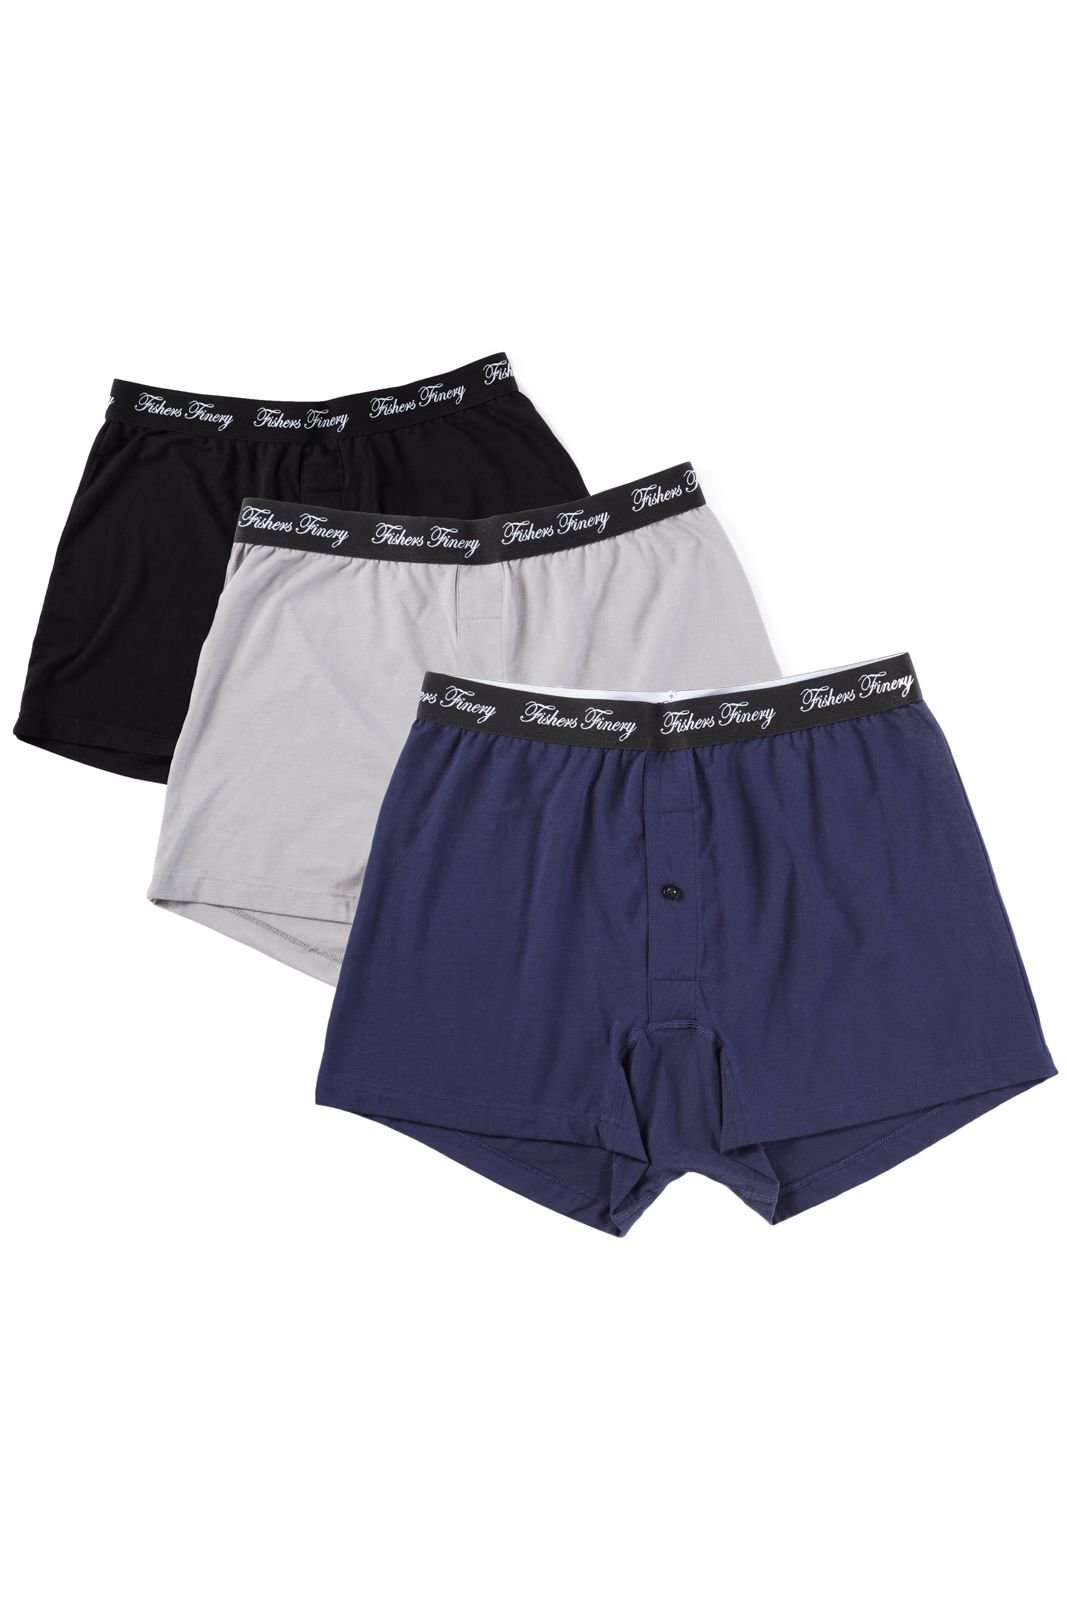 Fishers Finery Mens Tagless Modal Cotton Microfiber Boxers; 3 Pack (Multi, L)